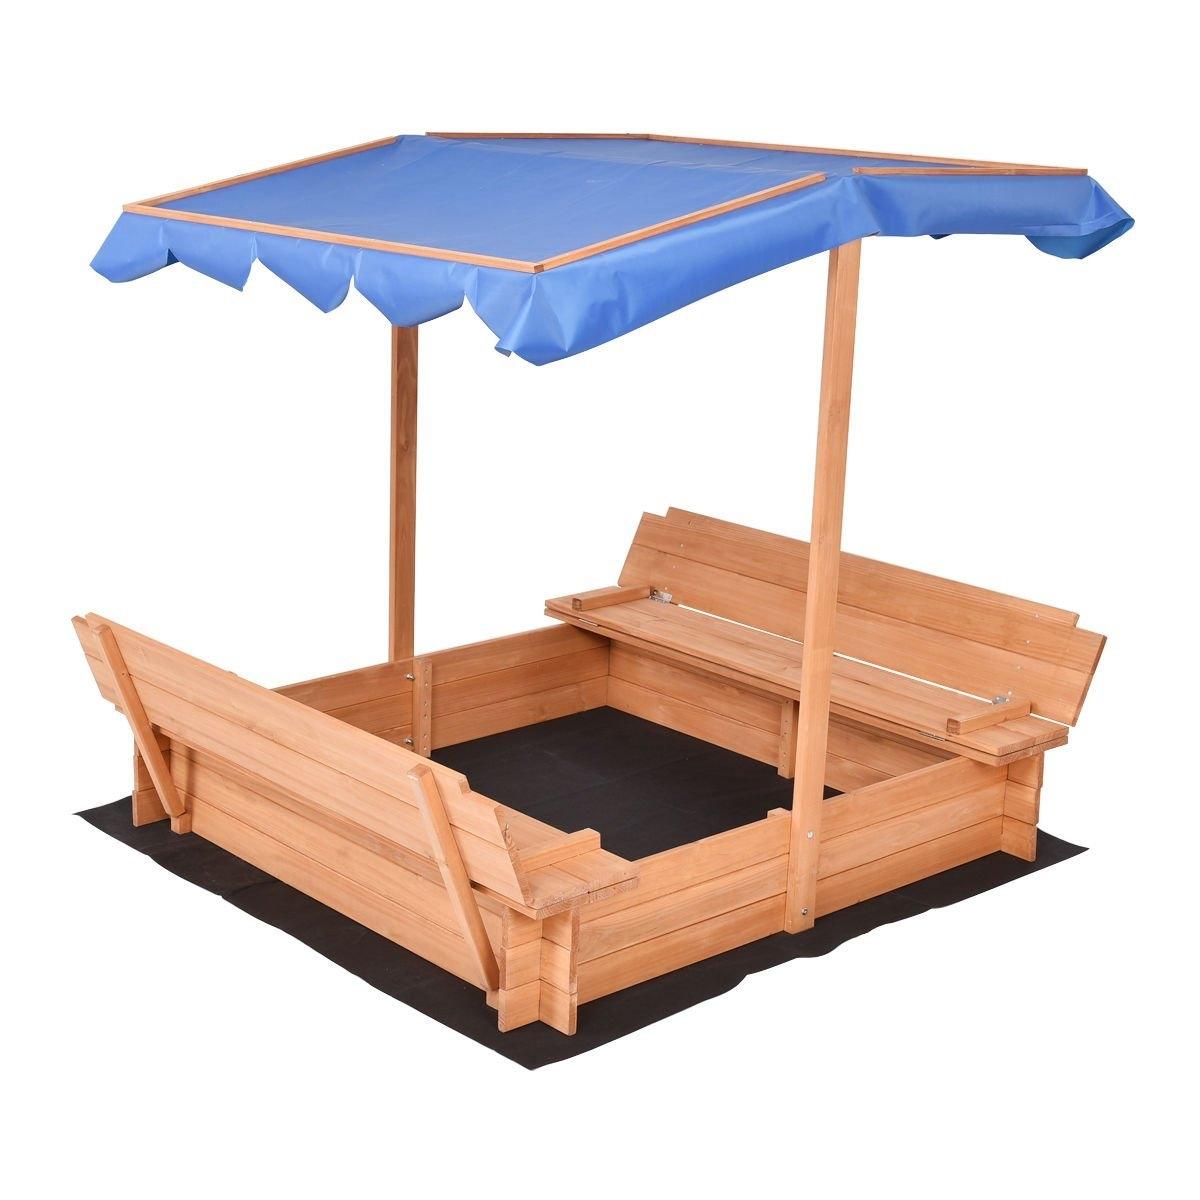 New MTN-G Beach Cabana Sandbox Retractable w/ Canopy Benc...